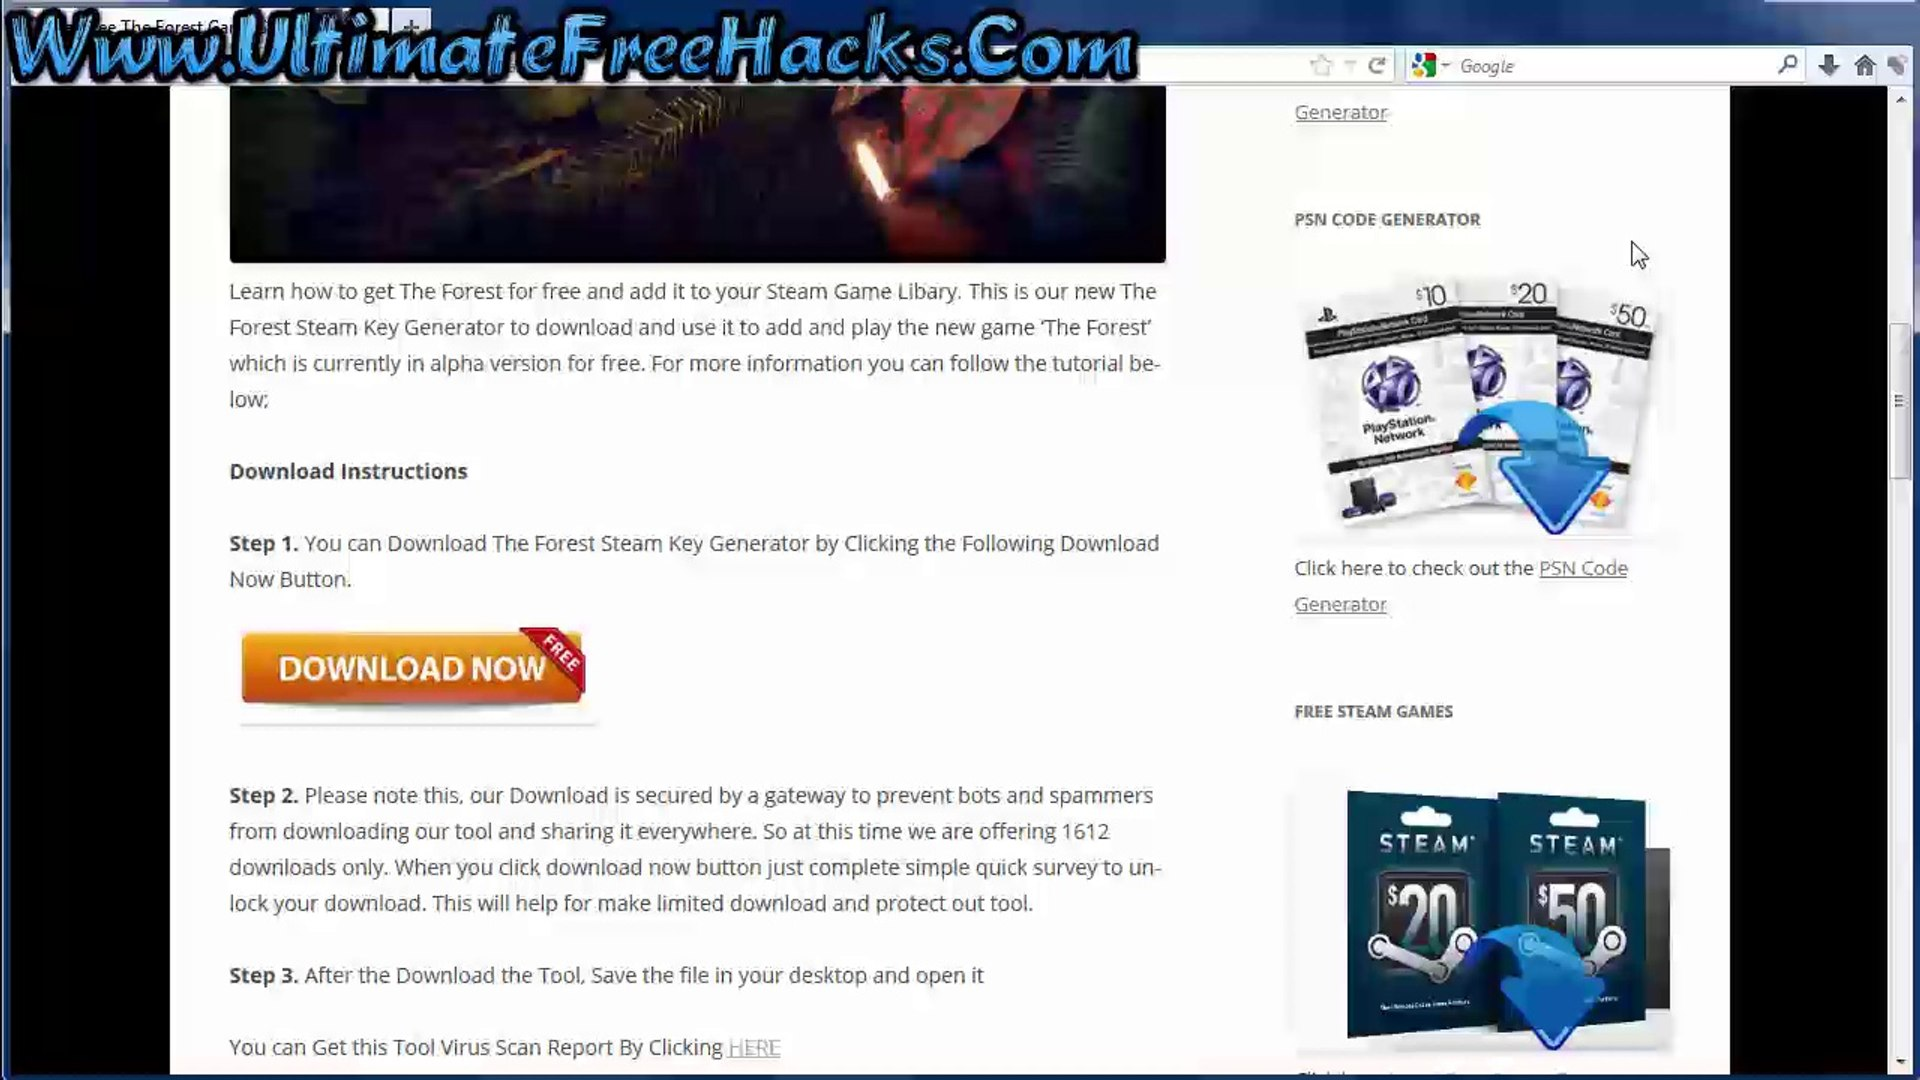 Download The Forest Keygen Free on Steam - Tutorial